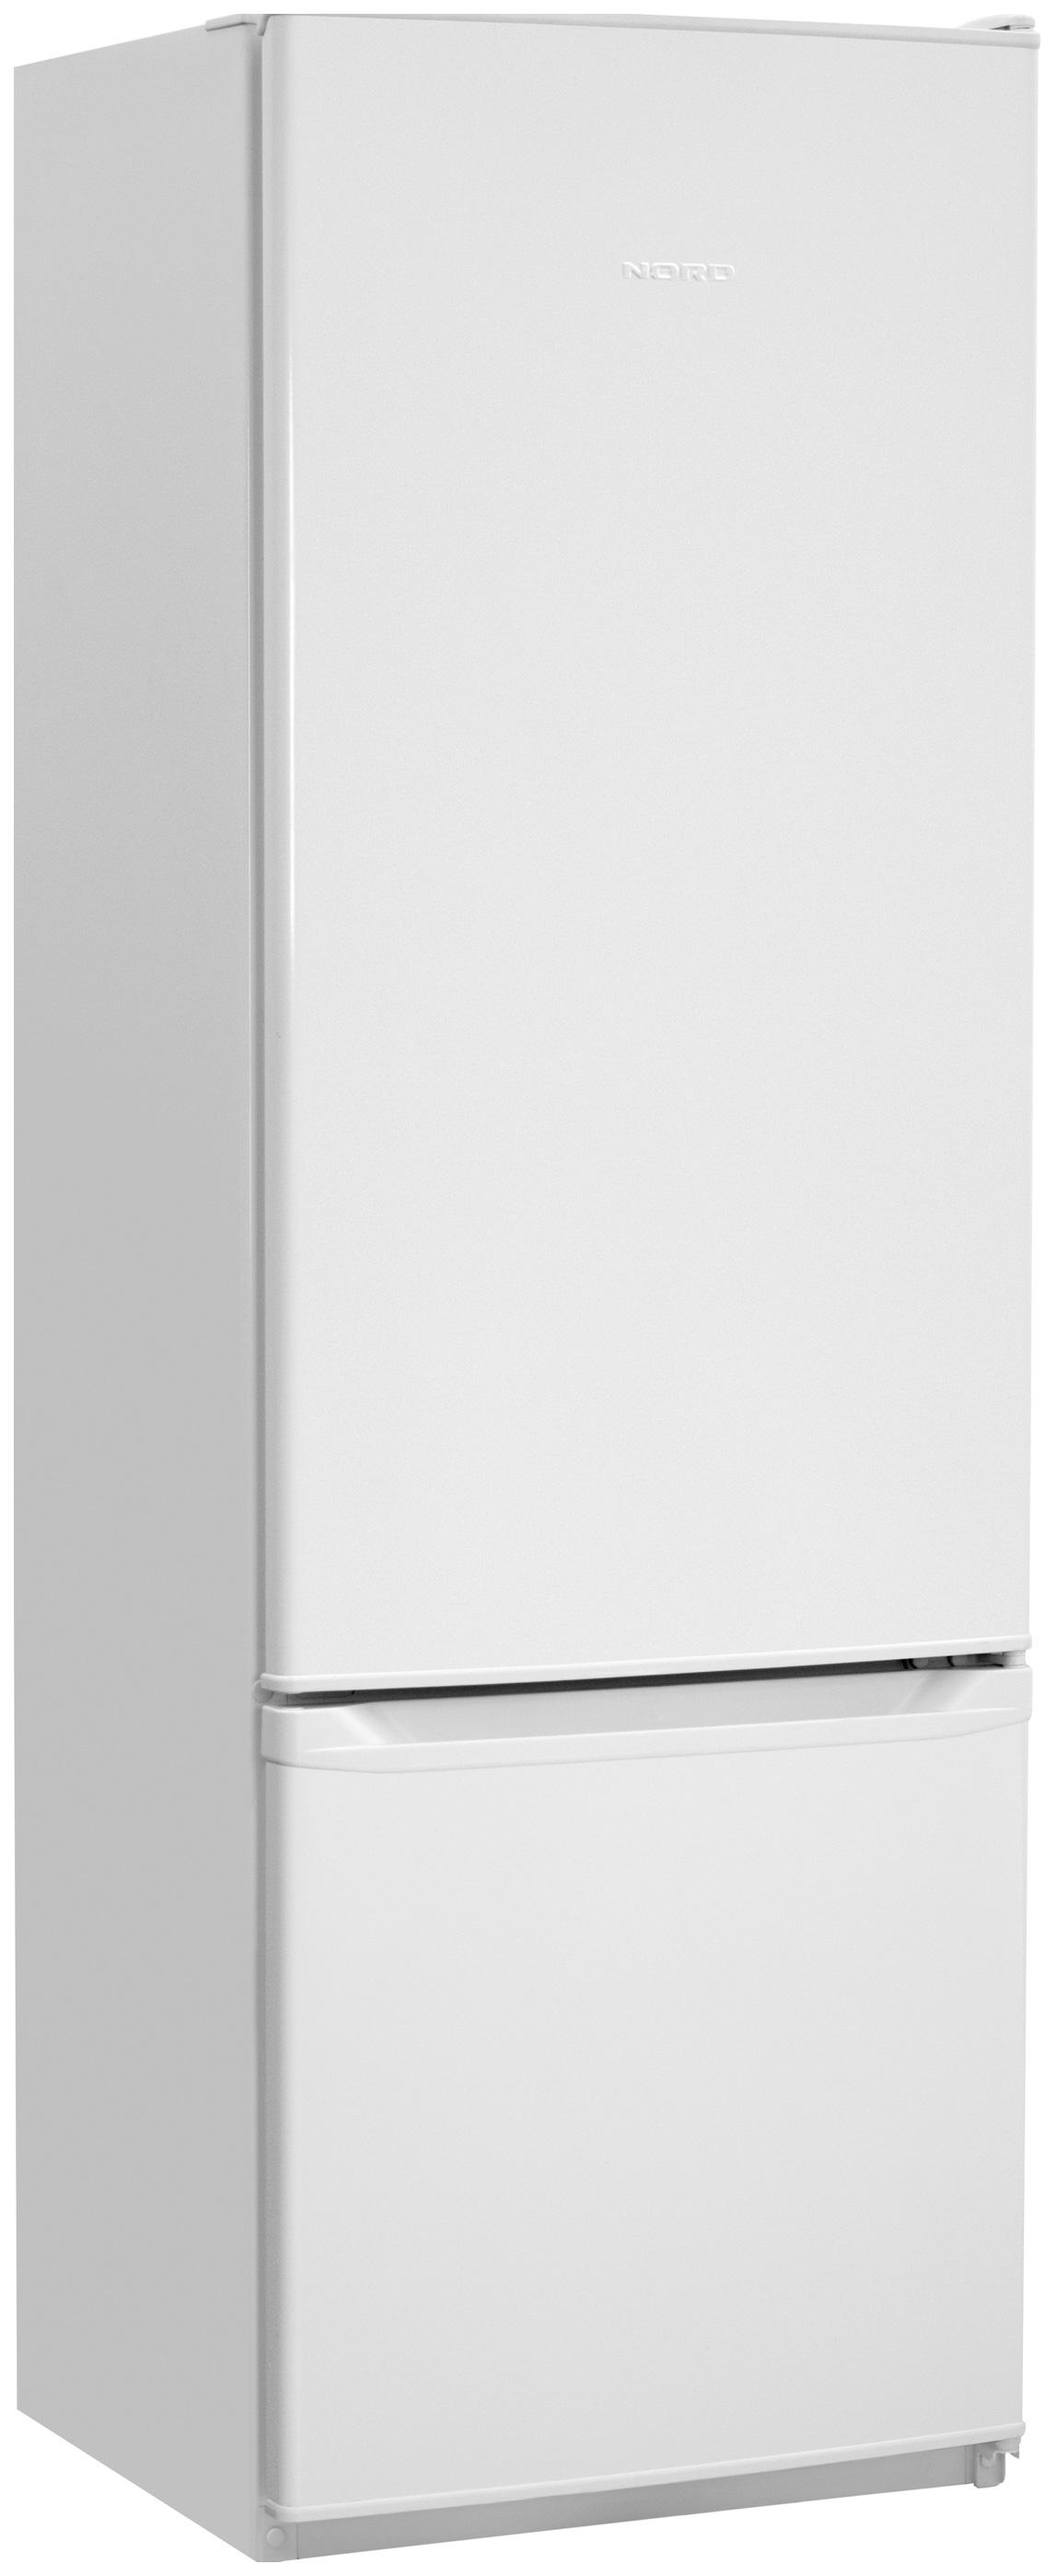 Холодильник NORD NRB 118 032 White